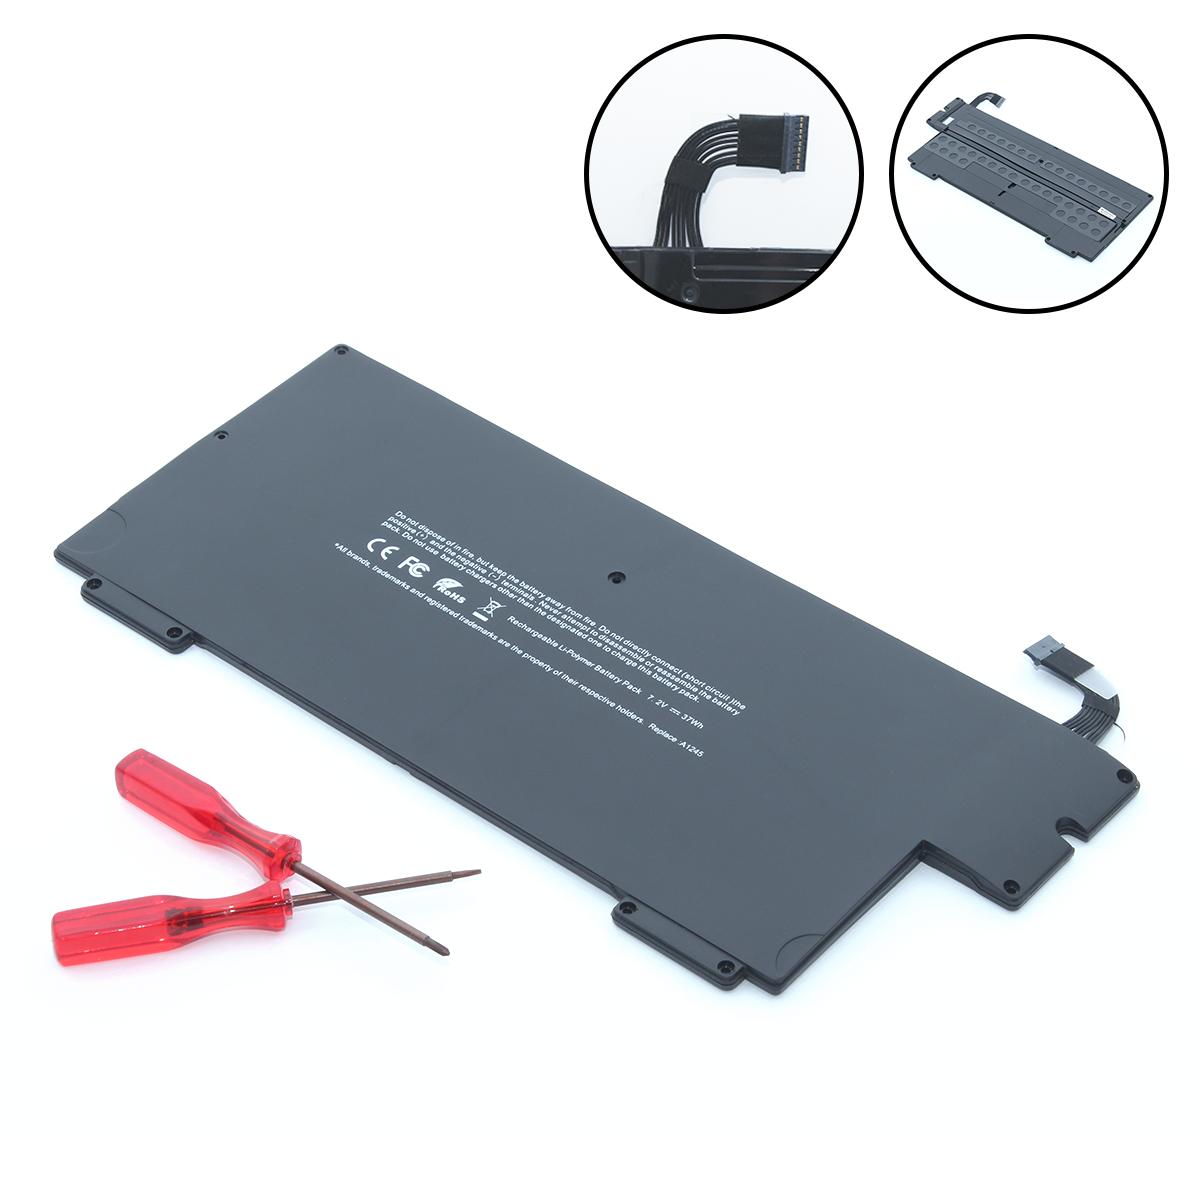 "Батарея, аккумулятор для MacBook Air 13"" 2008-2009 (A1237/1304)"